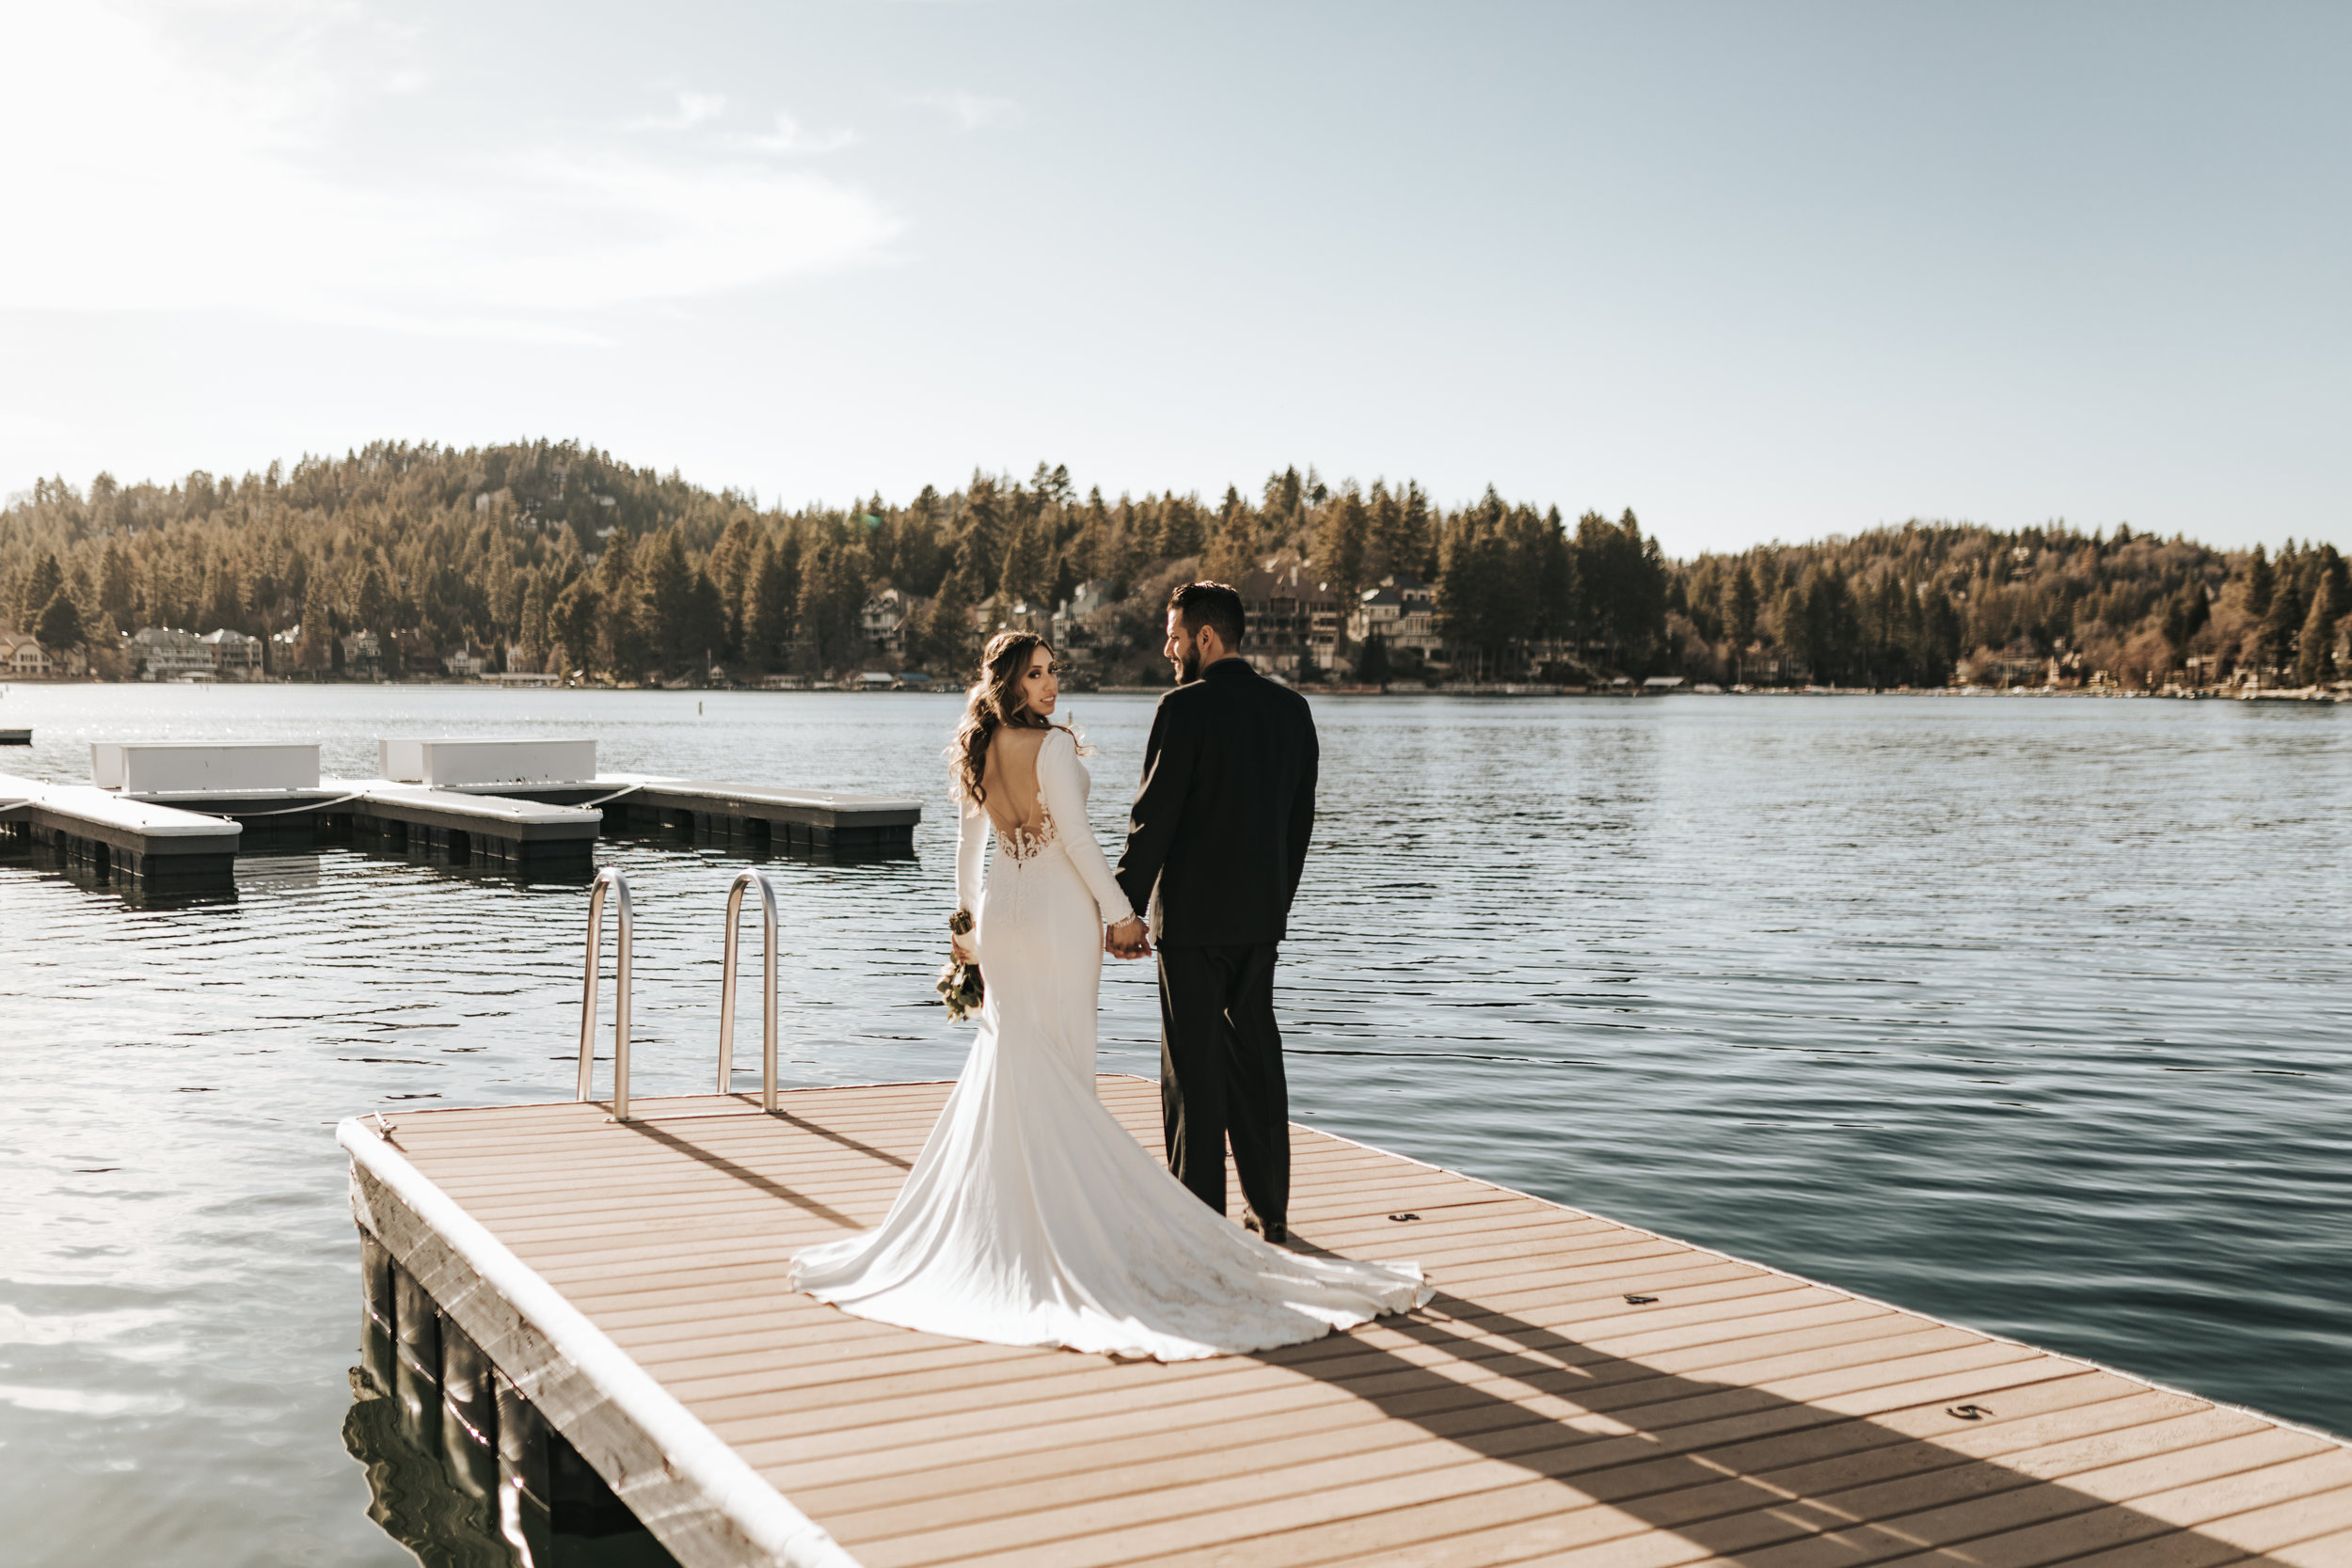 K+K Lake arrowhead intimate wedding (21).jpg